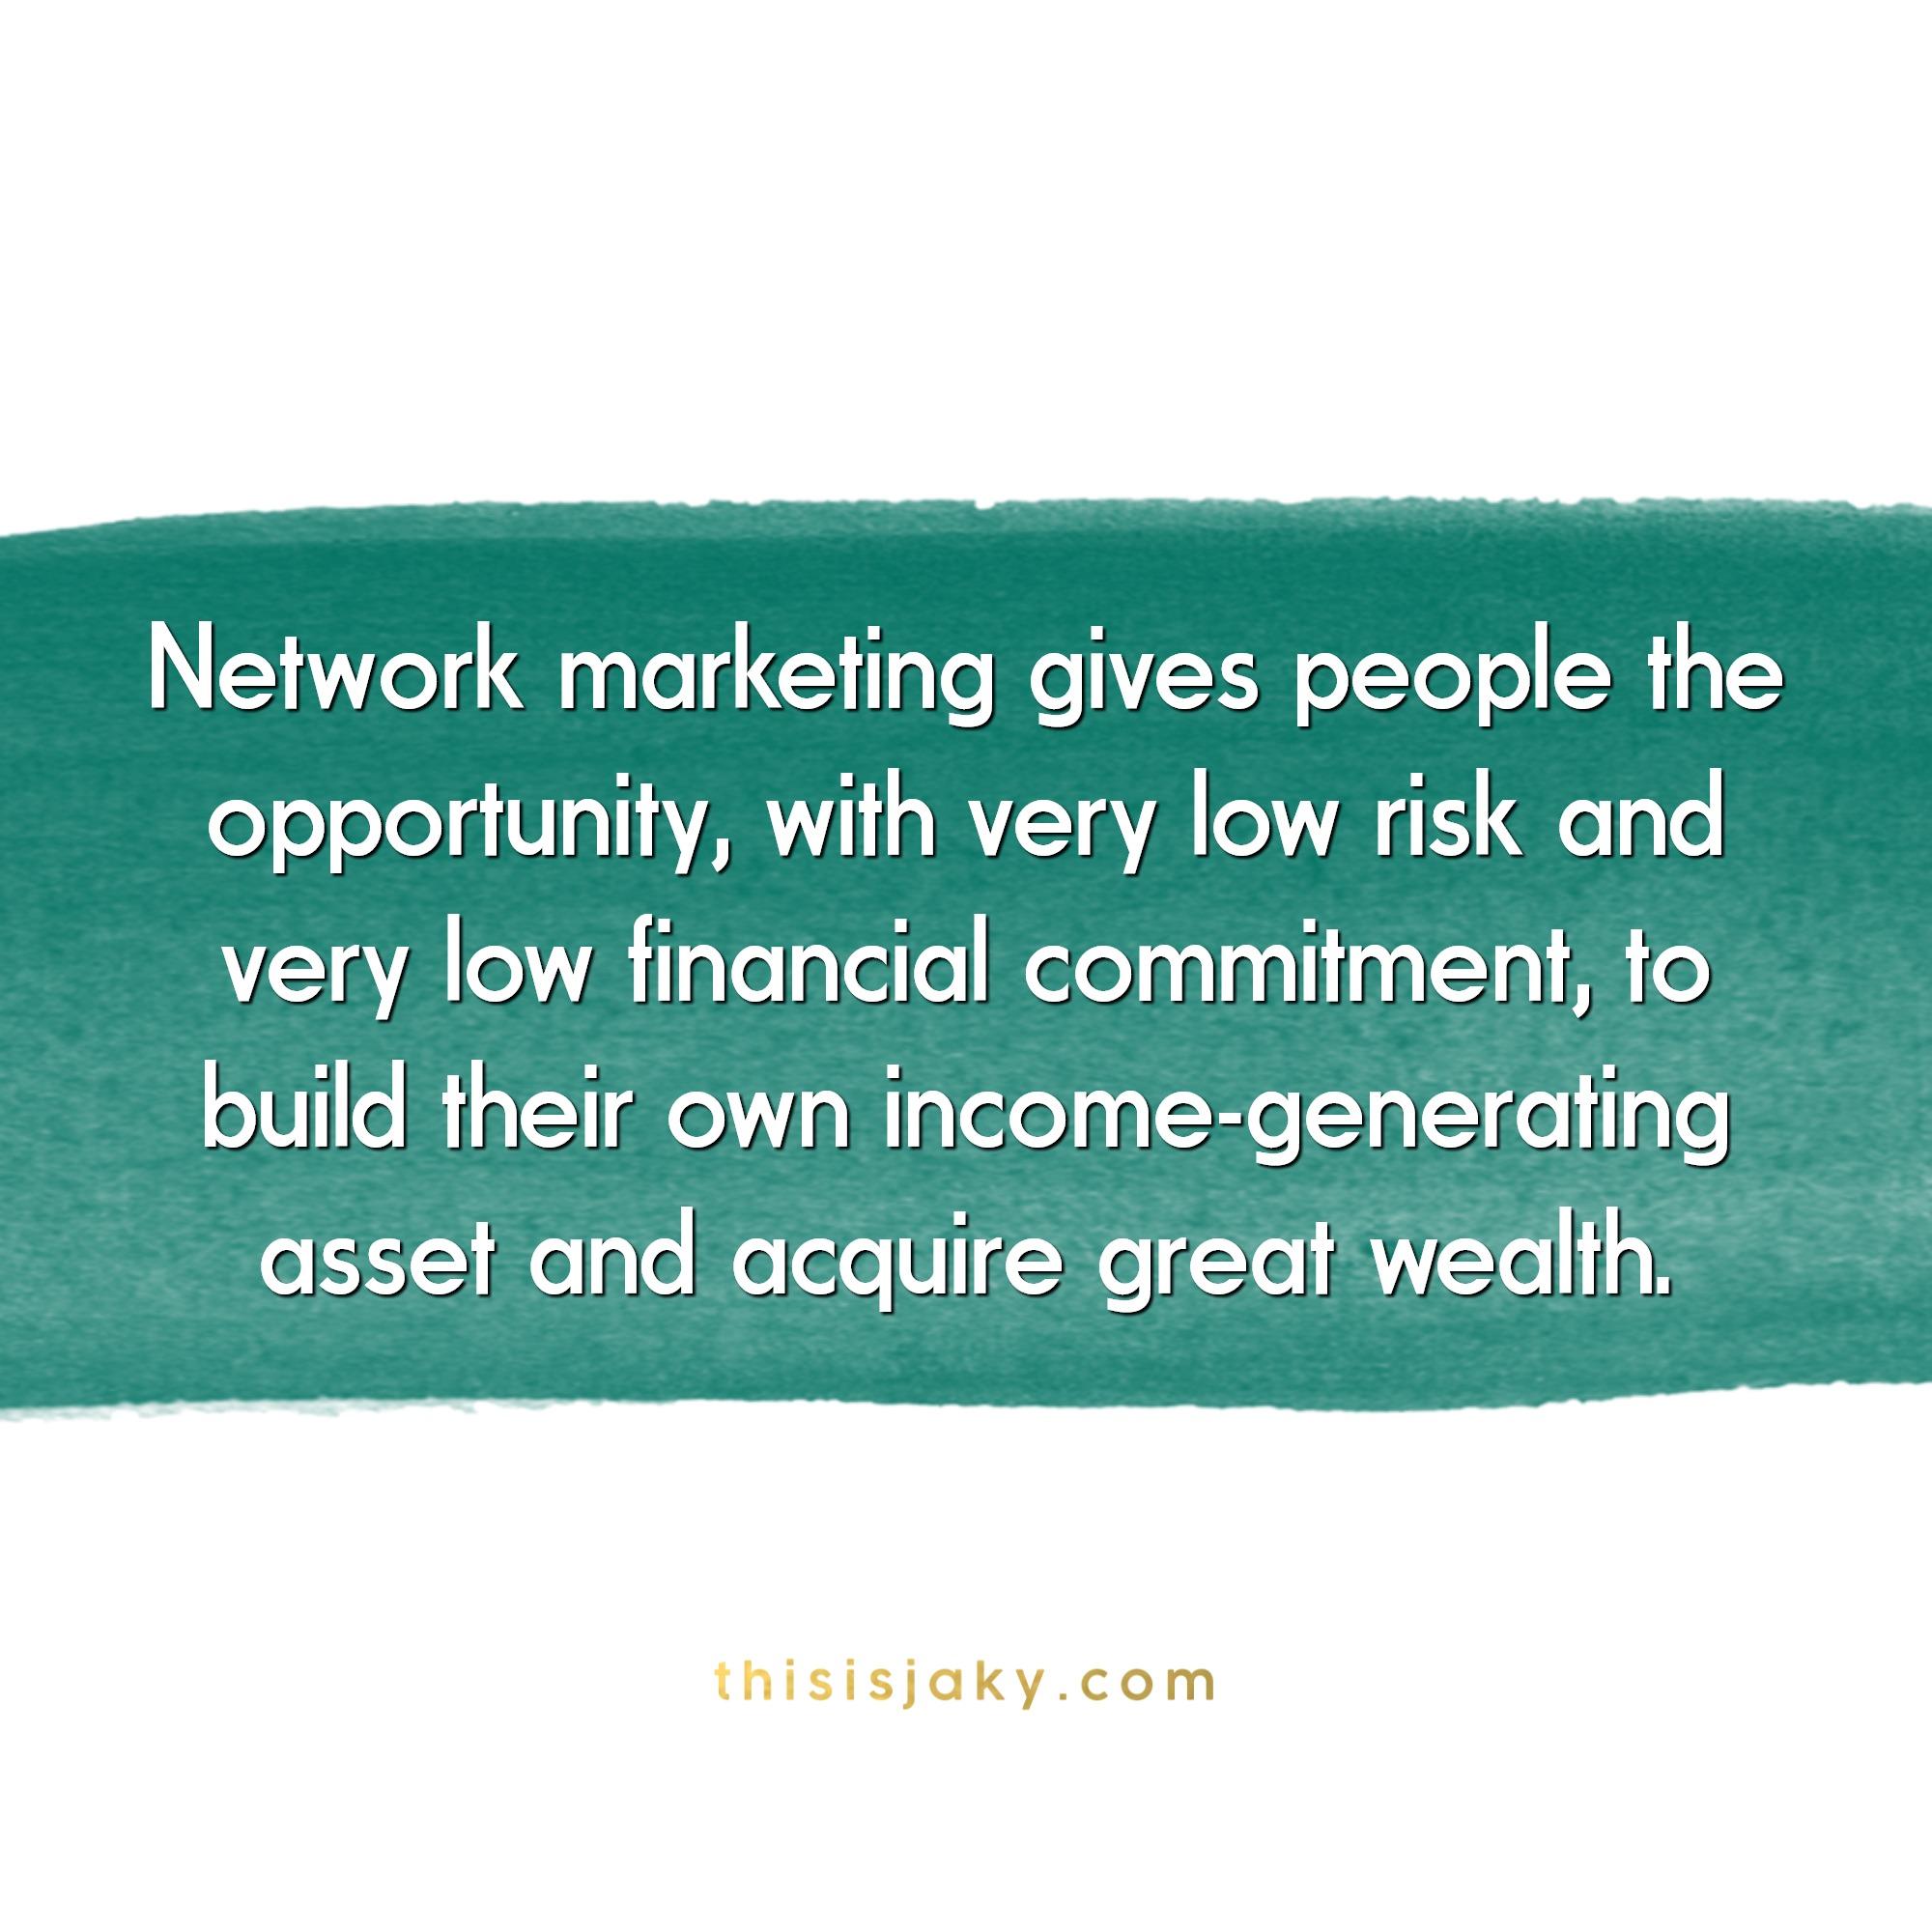 network marketing .jpg